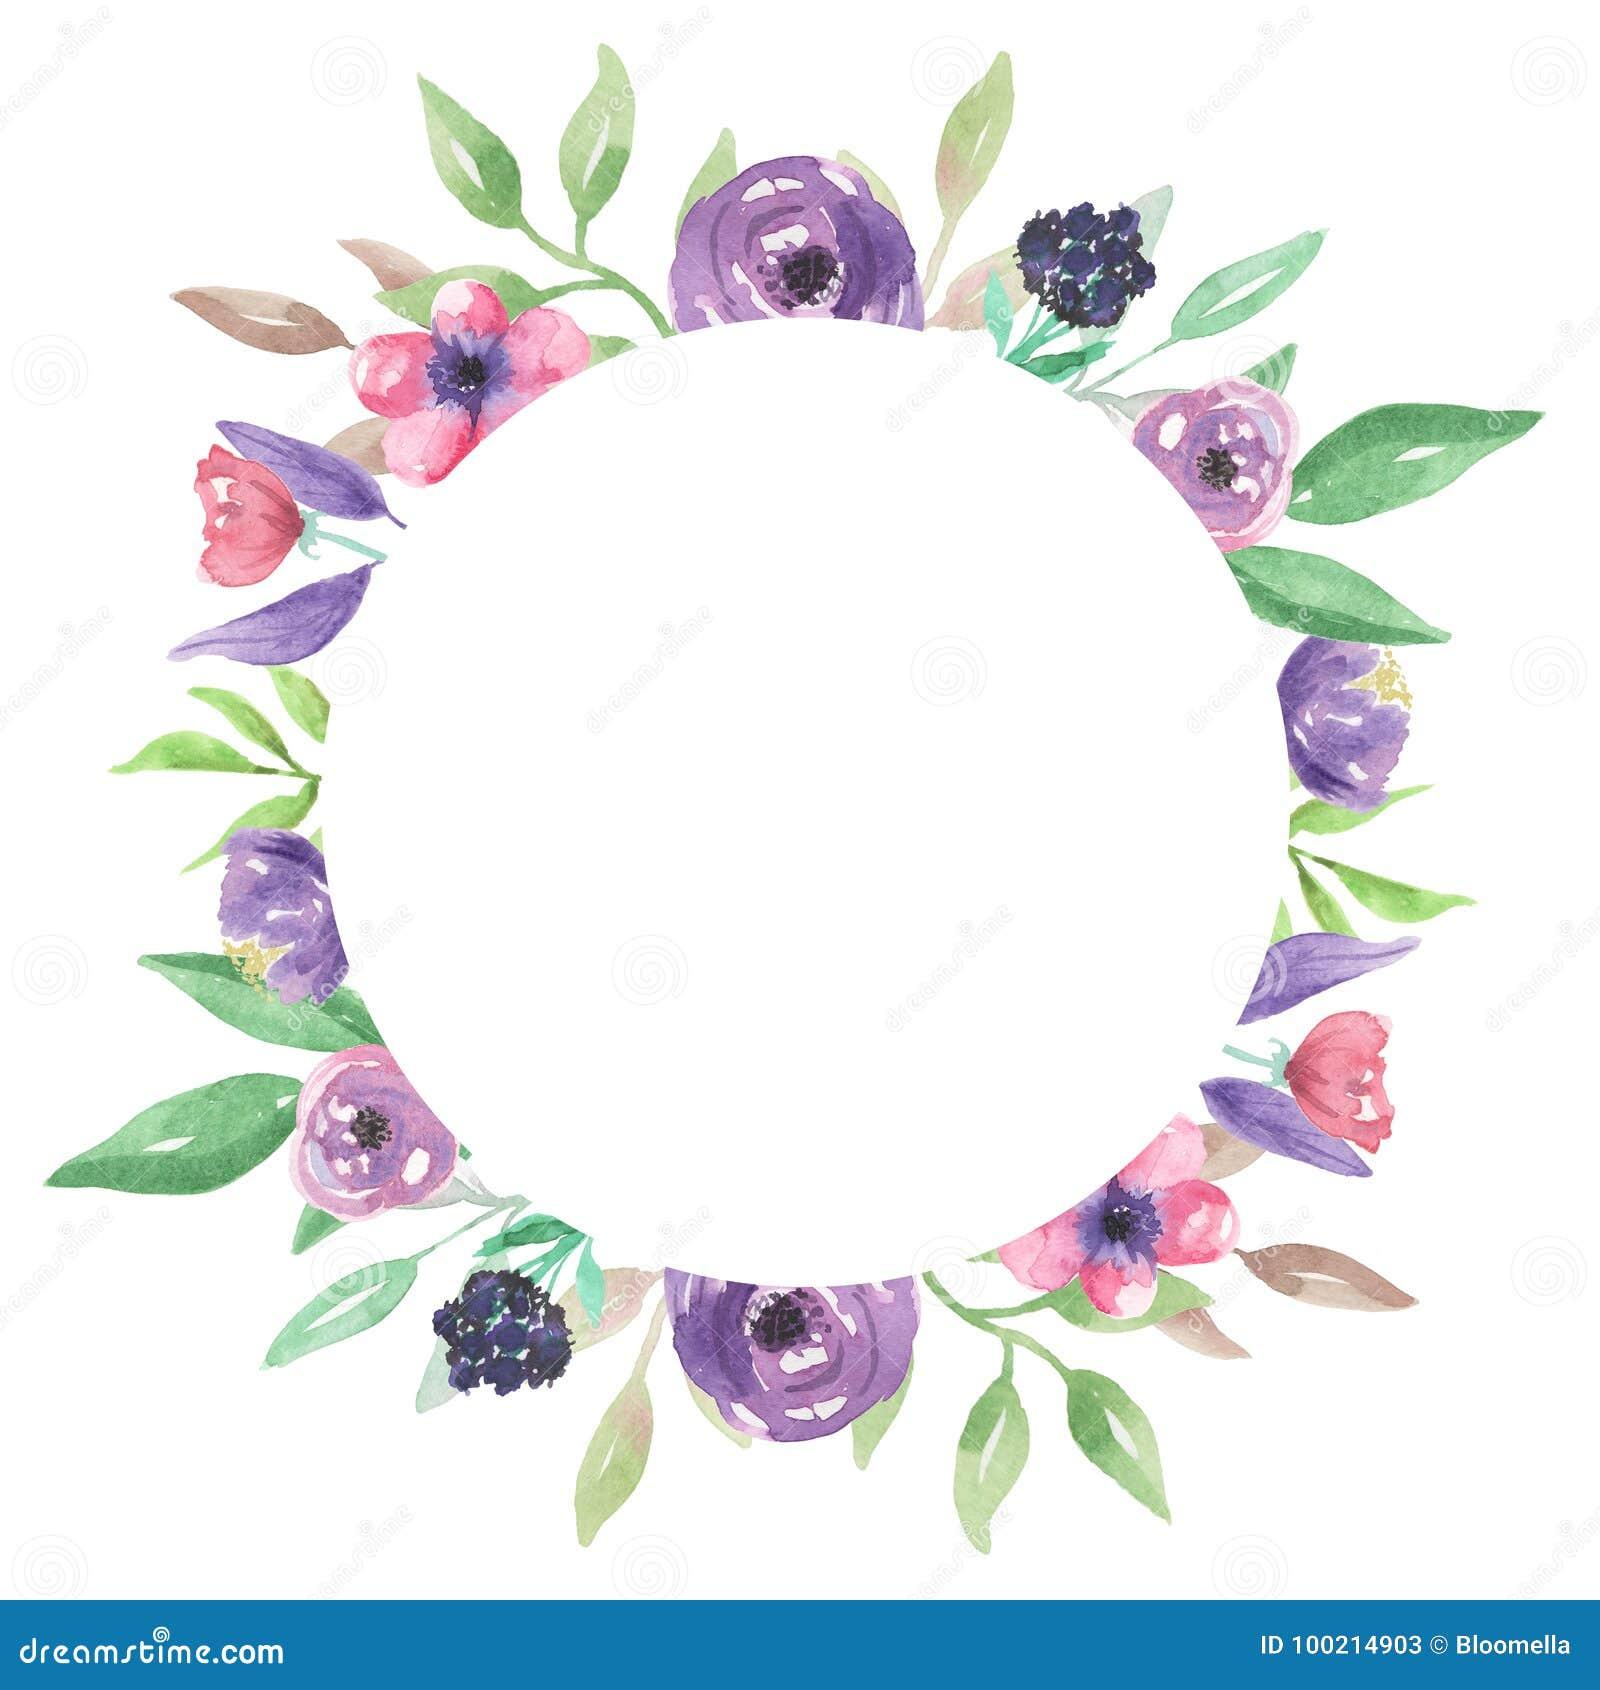 Watercolour Rahmen Rosa Purpurrote Kranz Hochzeits Blumen